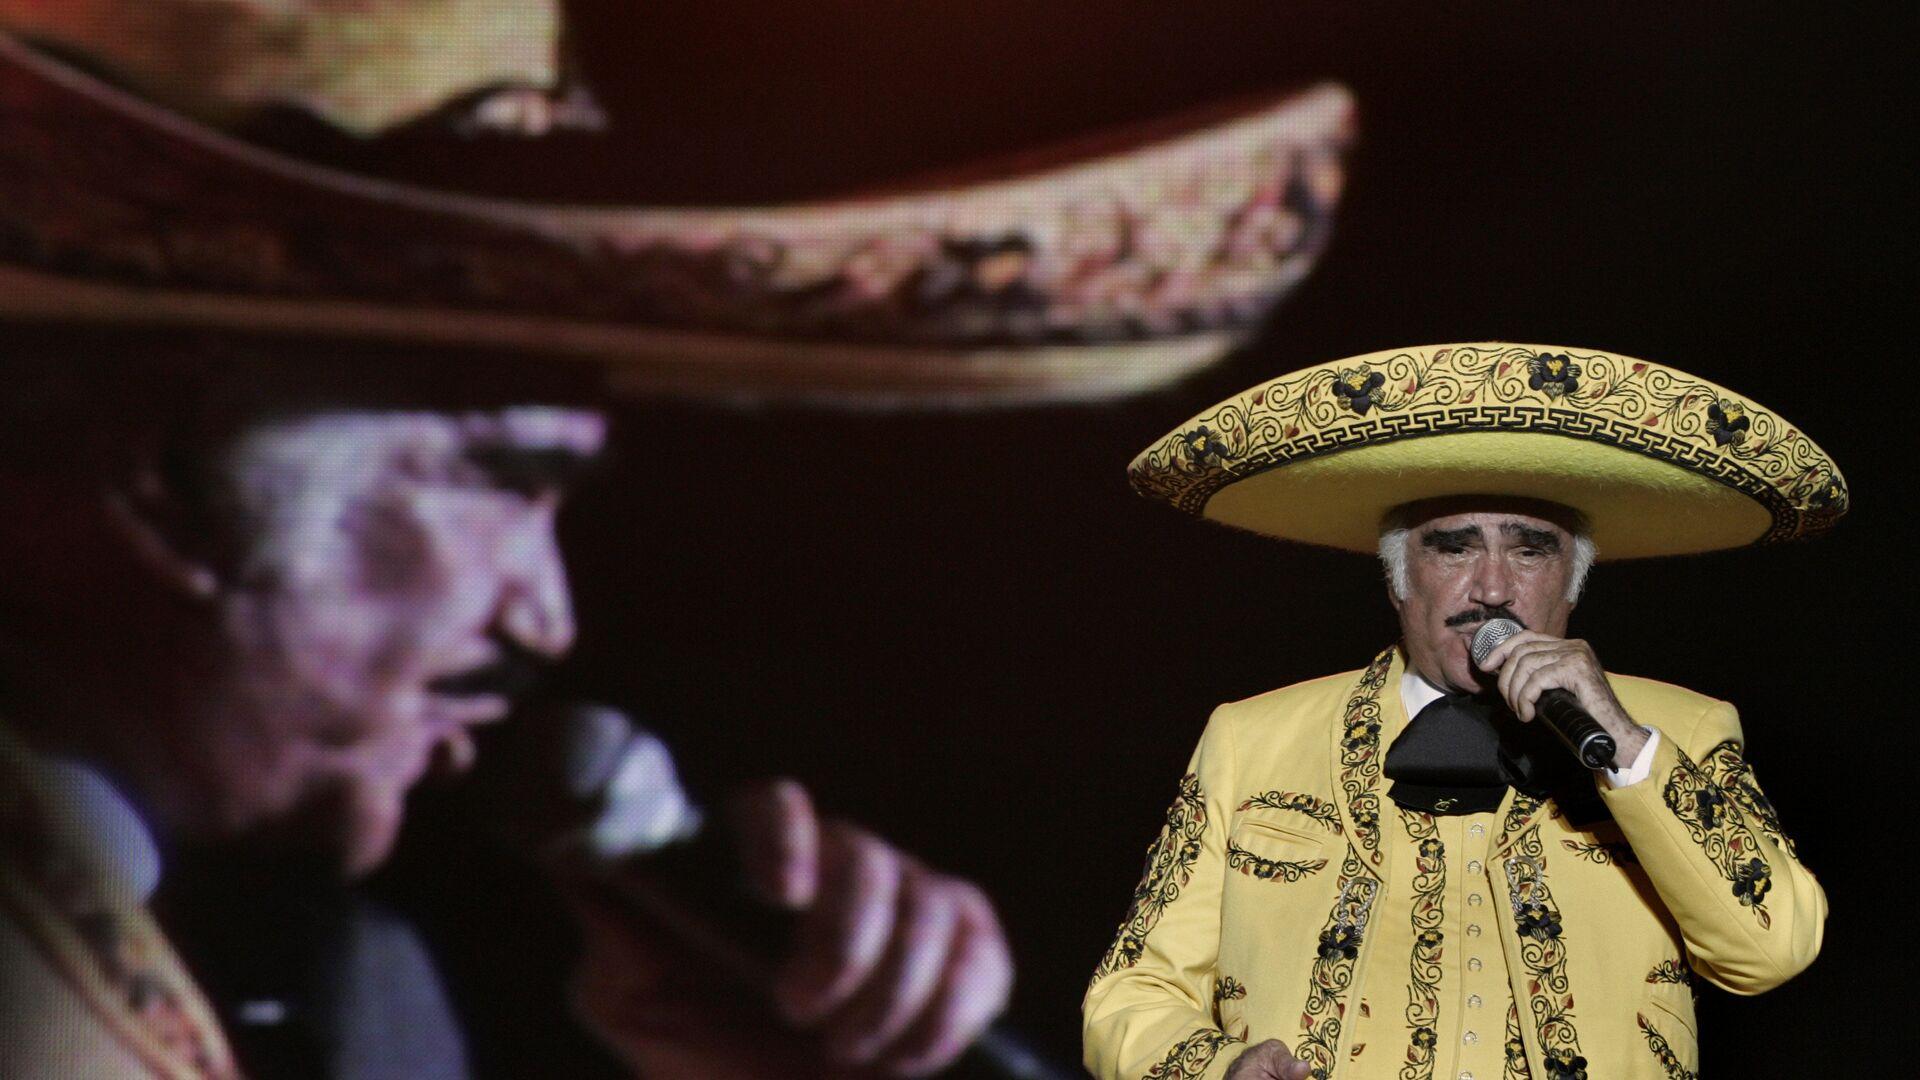 Cantante mexicano Vicente Fernández - Sputnik Mundo, 1920, 08.10.2021